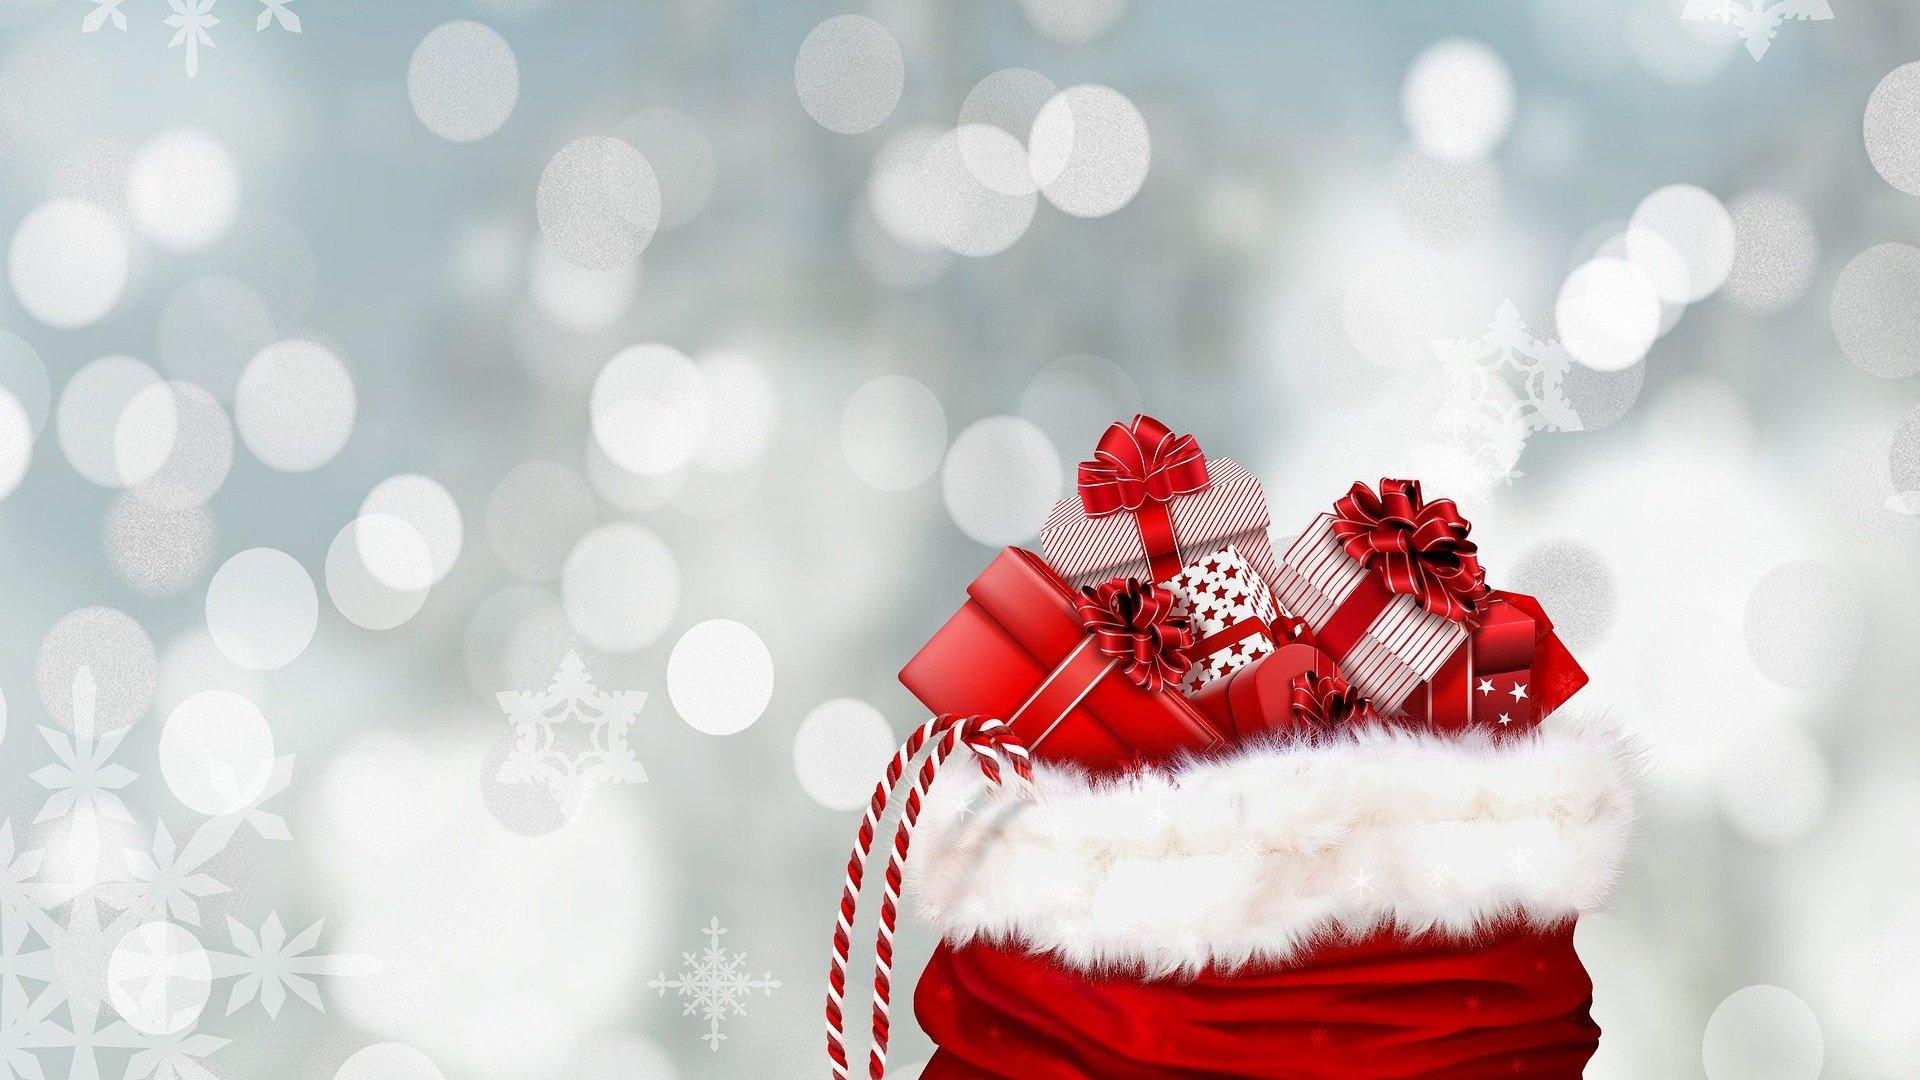 14. December - Stressjulekalenderen